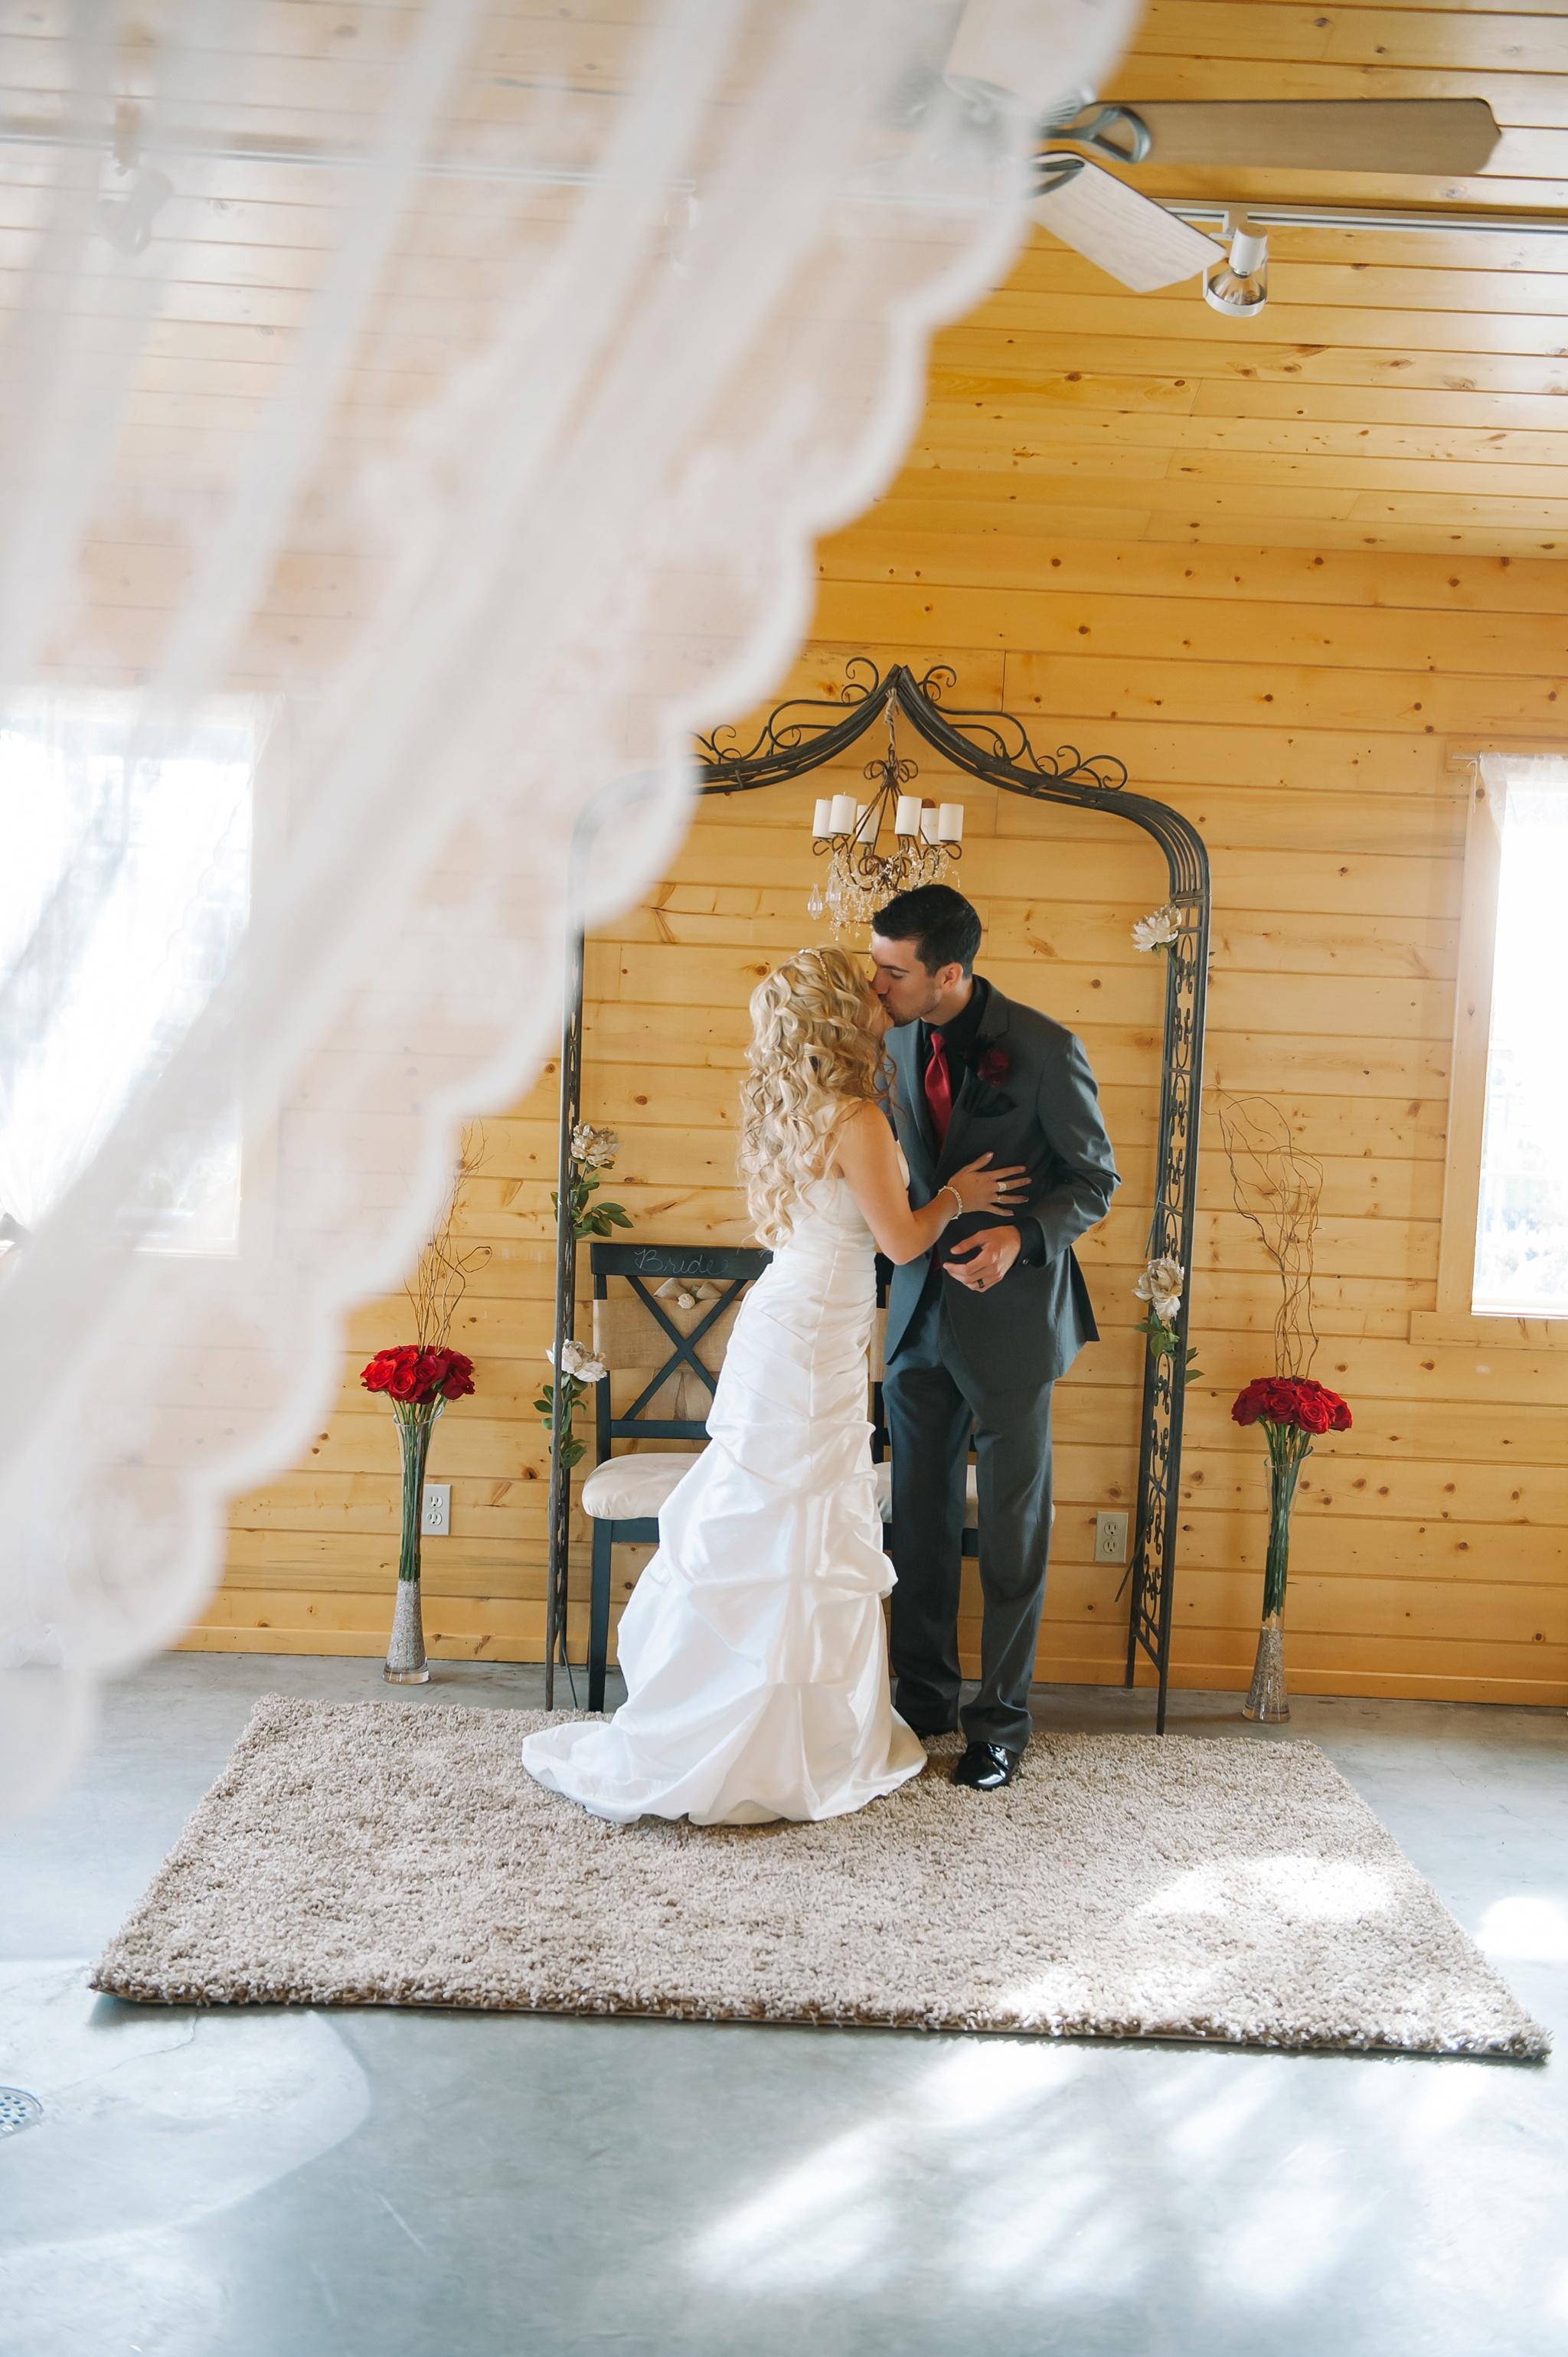 SLC Utah Wedding Photographer Ali Sumsion 039